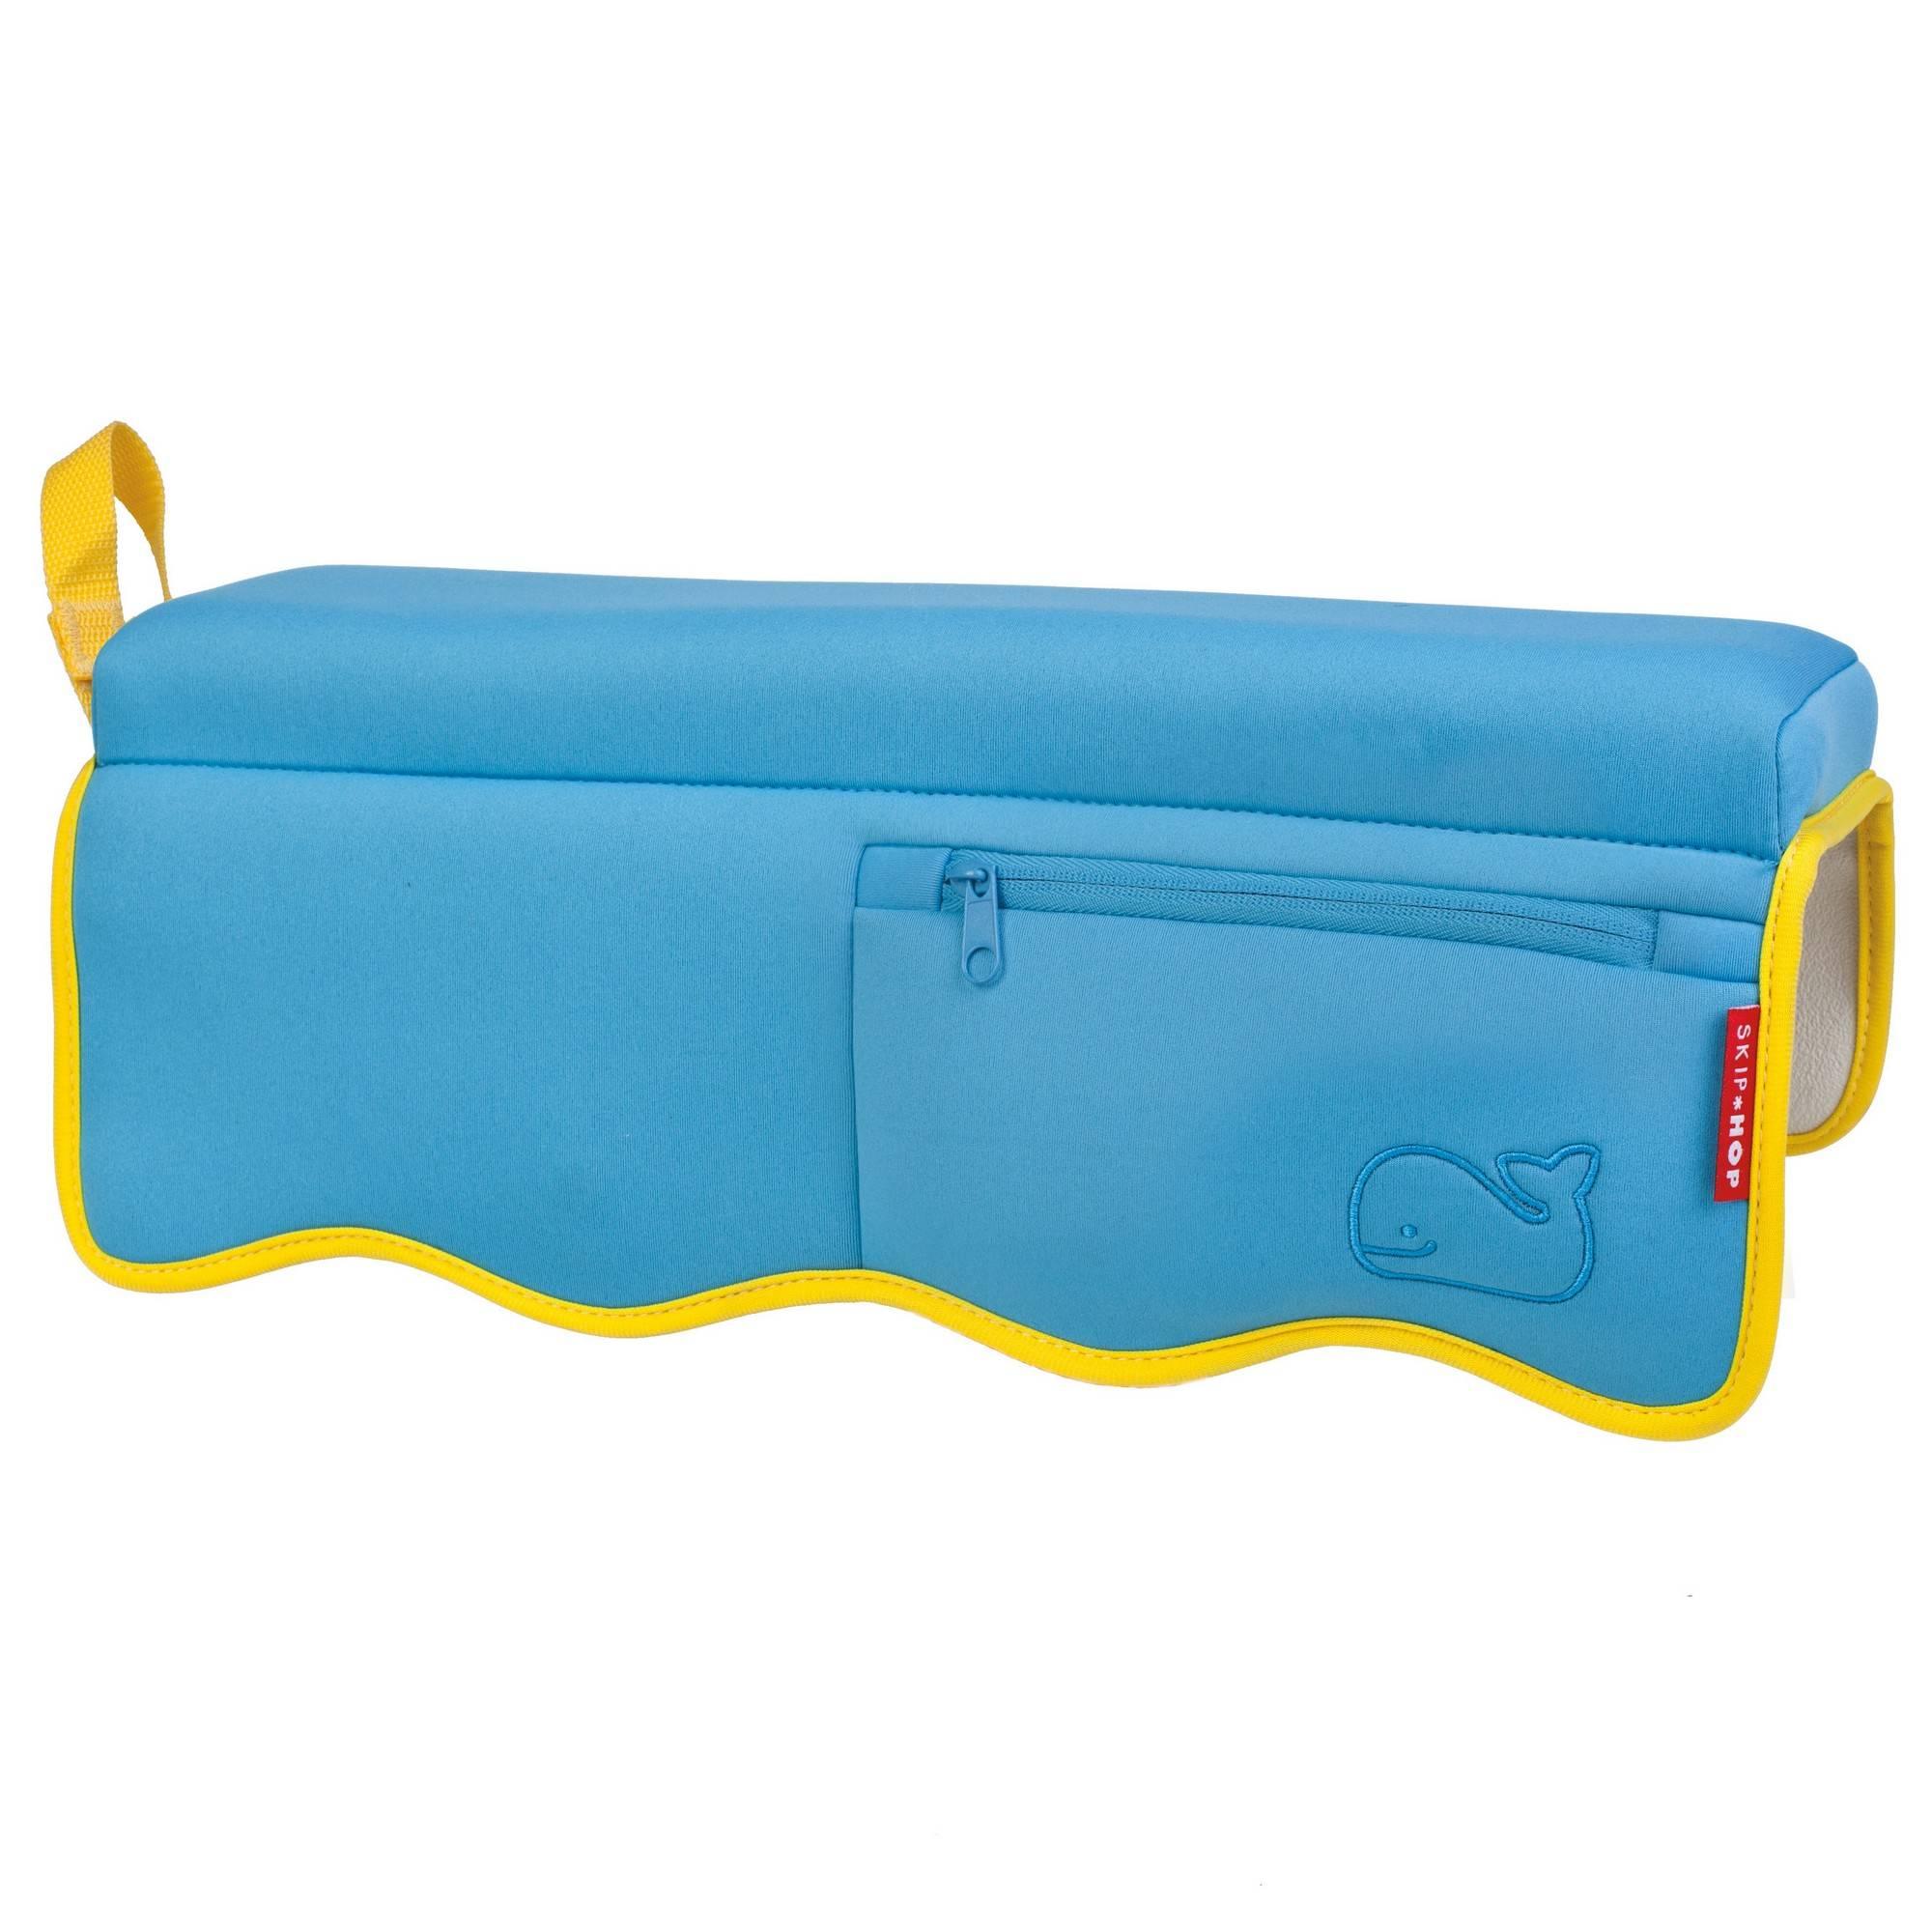 bath hop moby mat p skip accessories mats